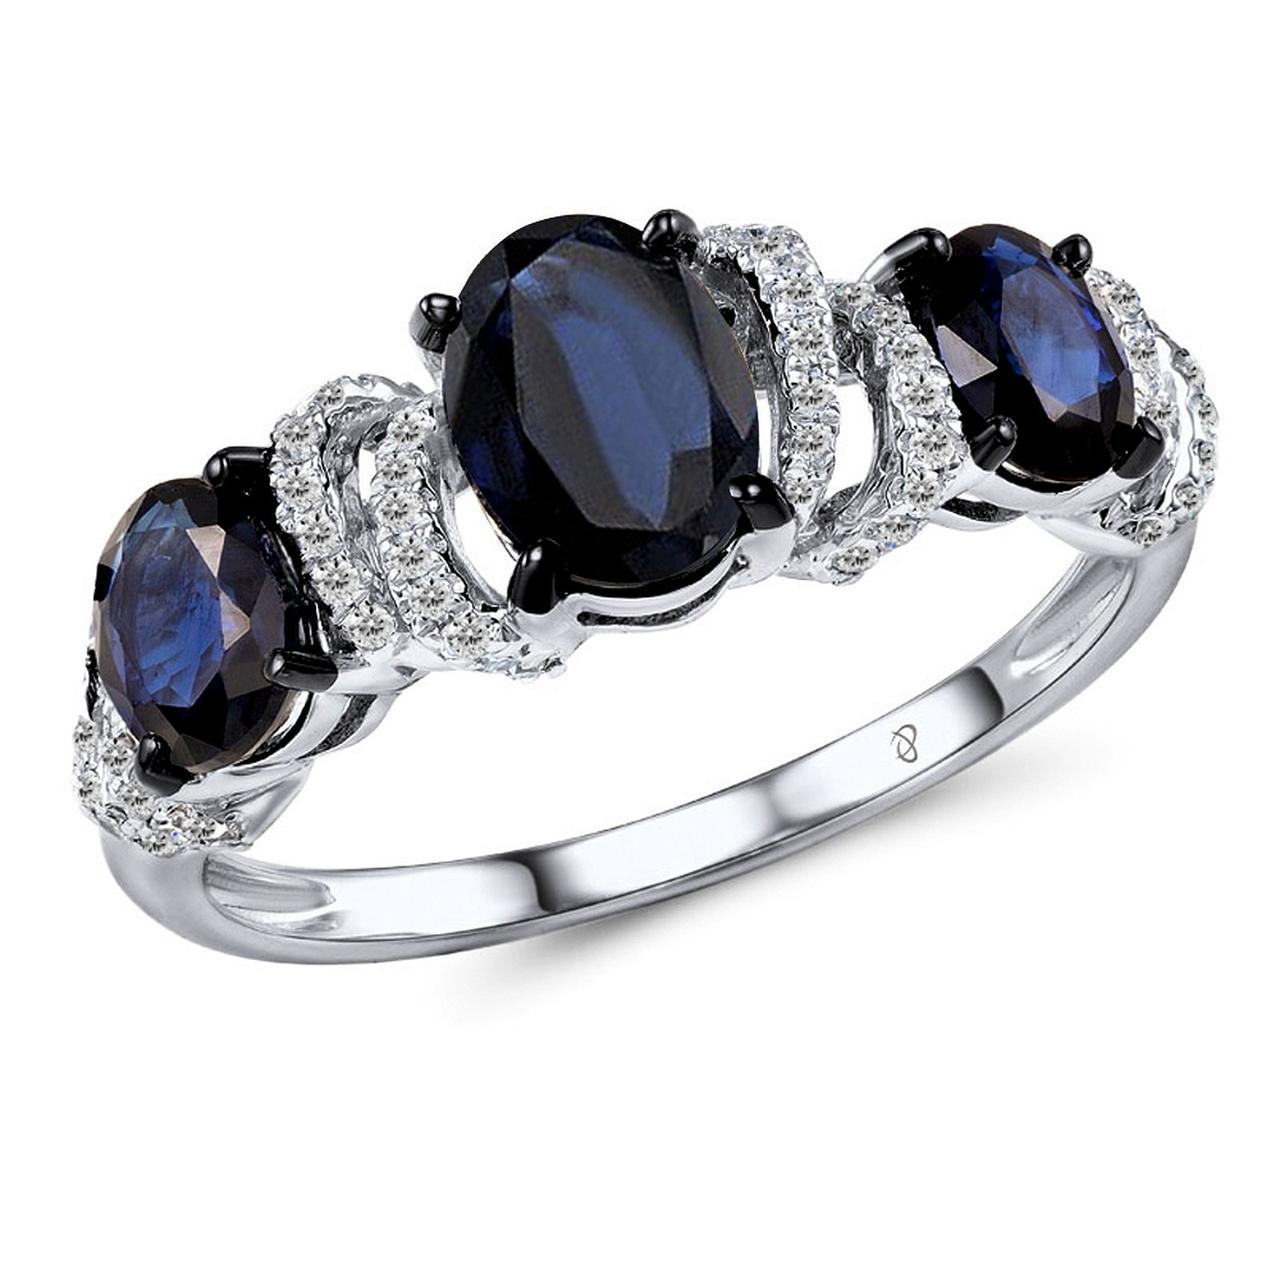 Золотое кольцо с бриллиантами и сапфирами, размер 16.5 (1553154)